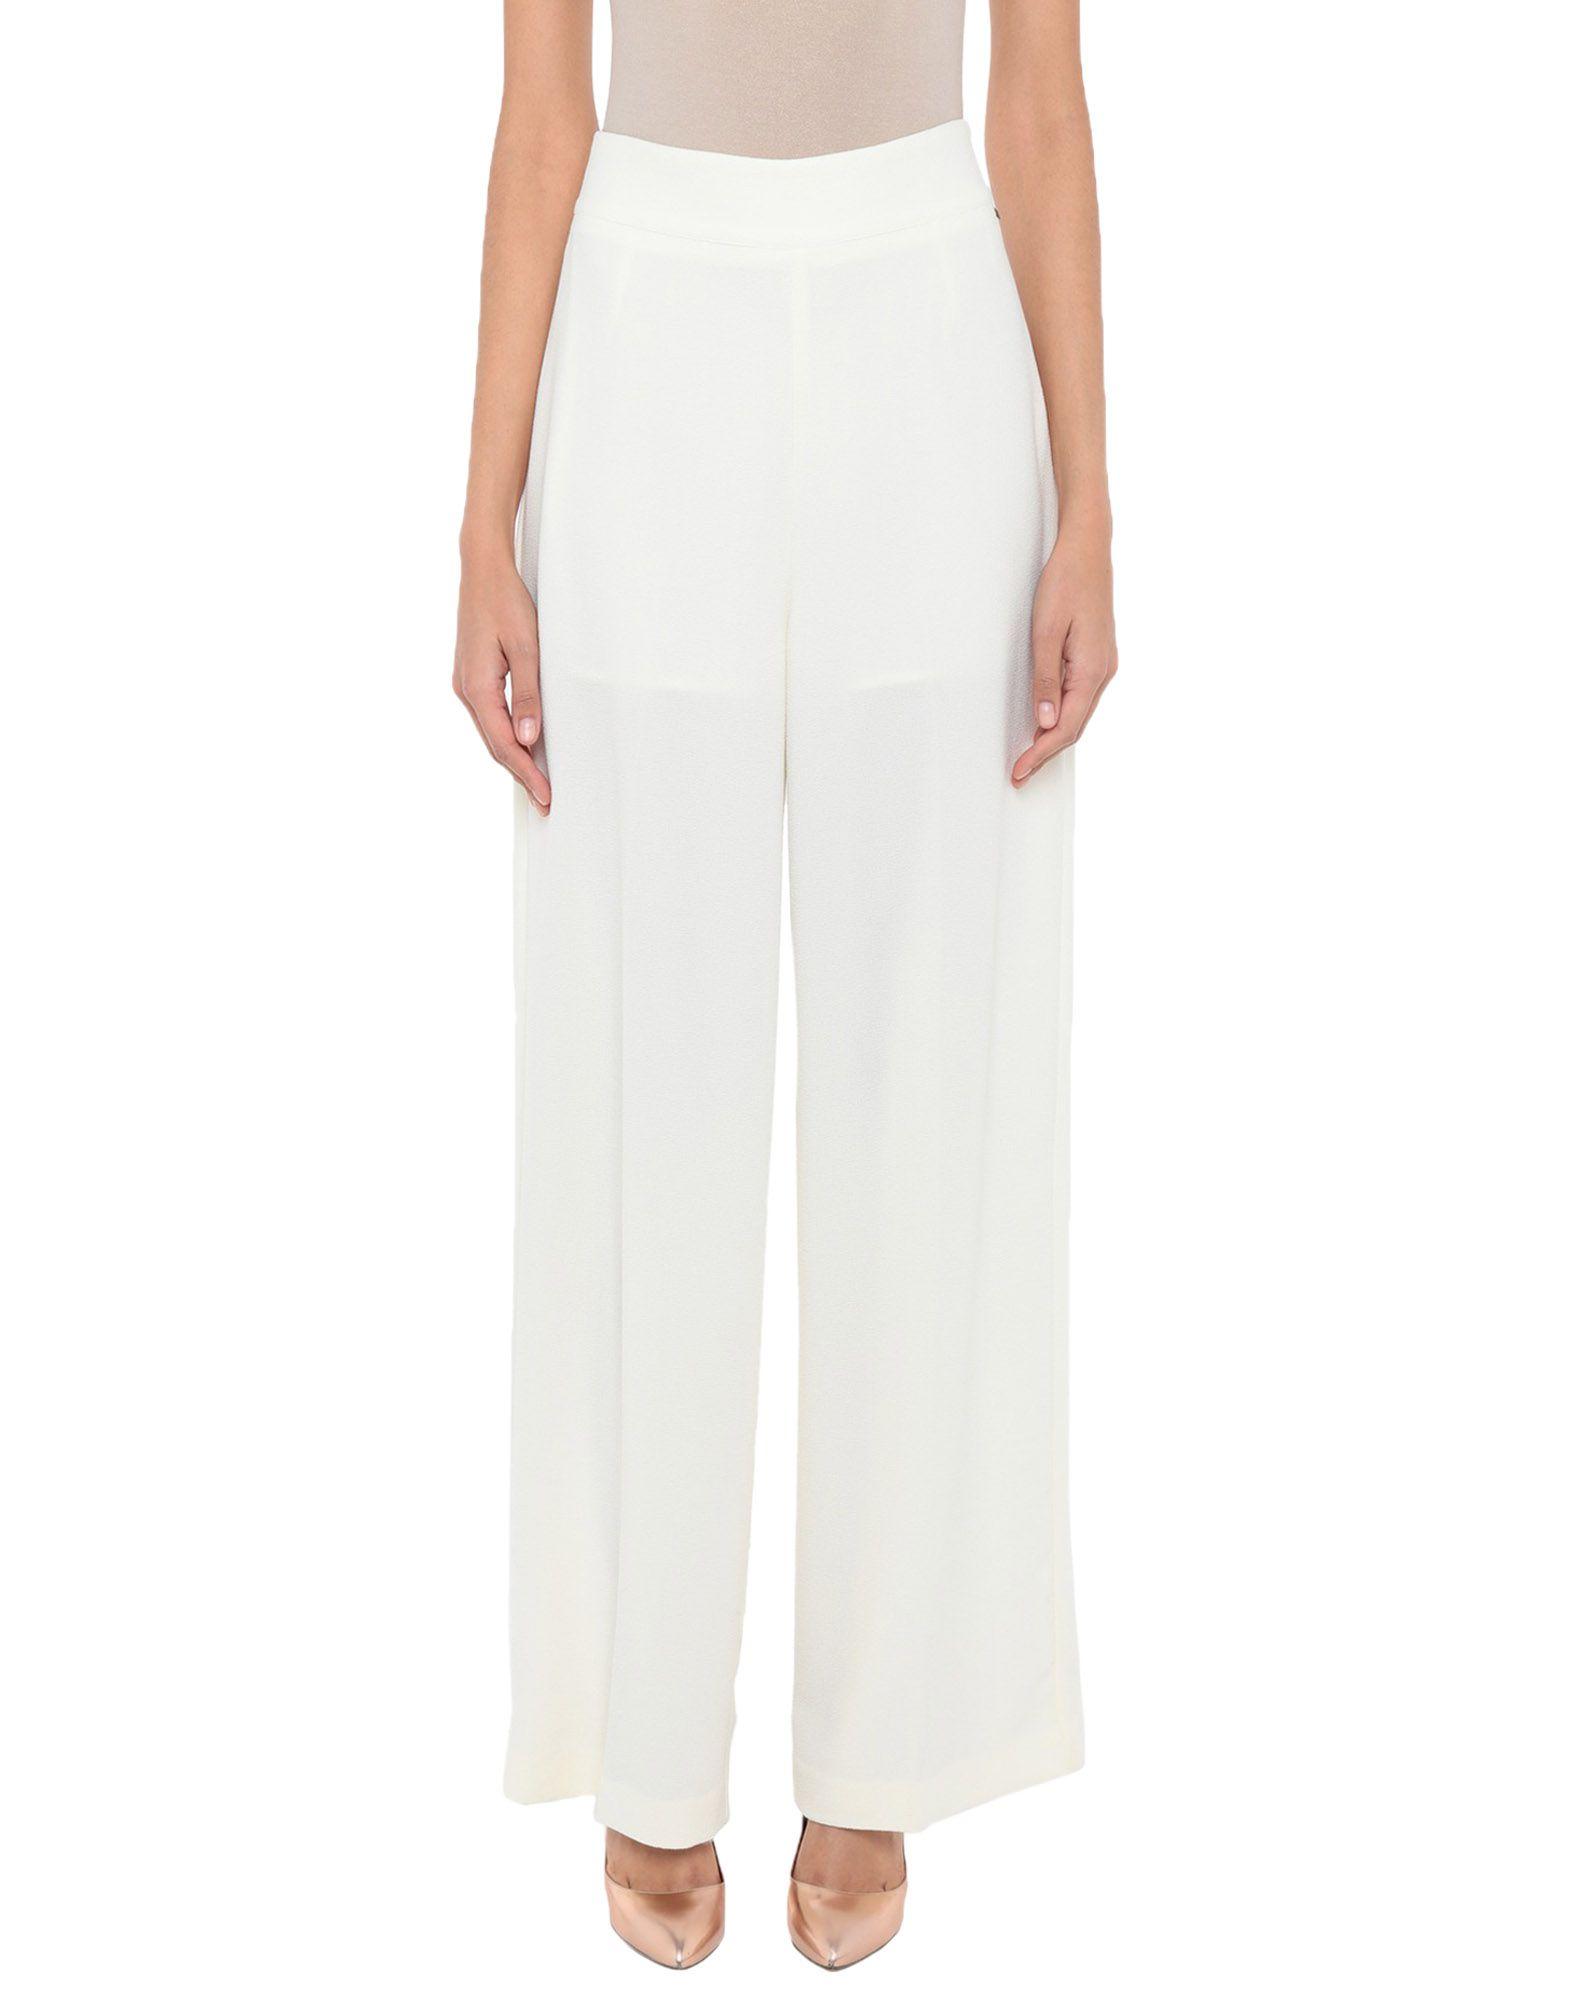 Pantalone Pantalone Pantalone Pepe Jeans donna - 13294288SA 8c3